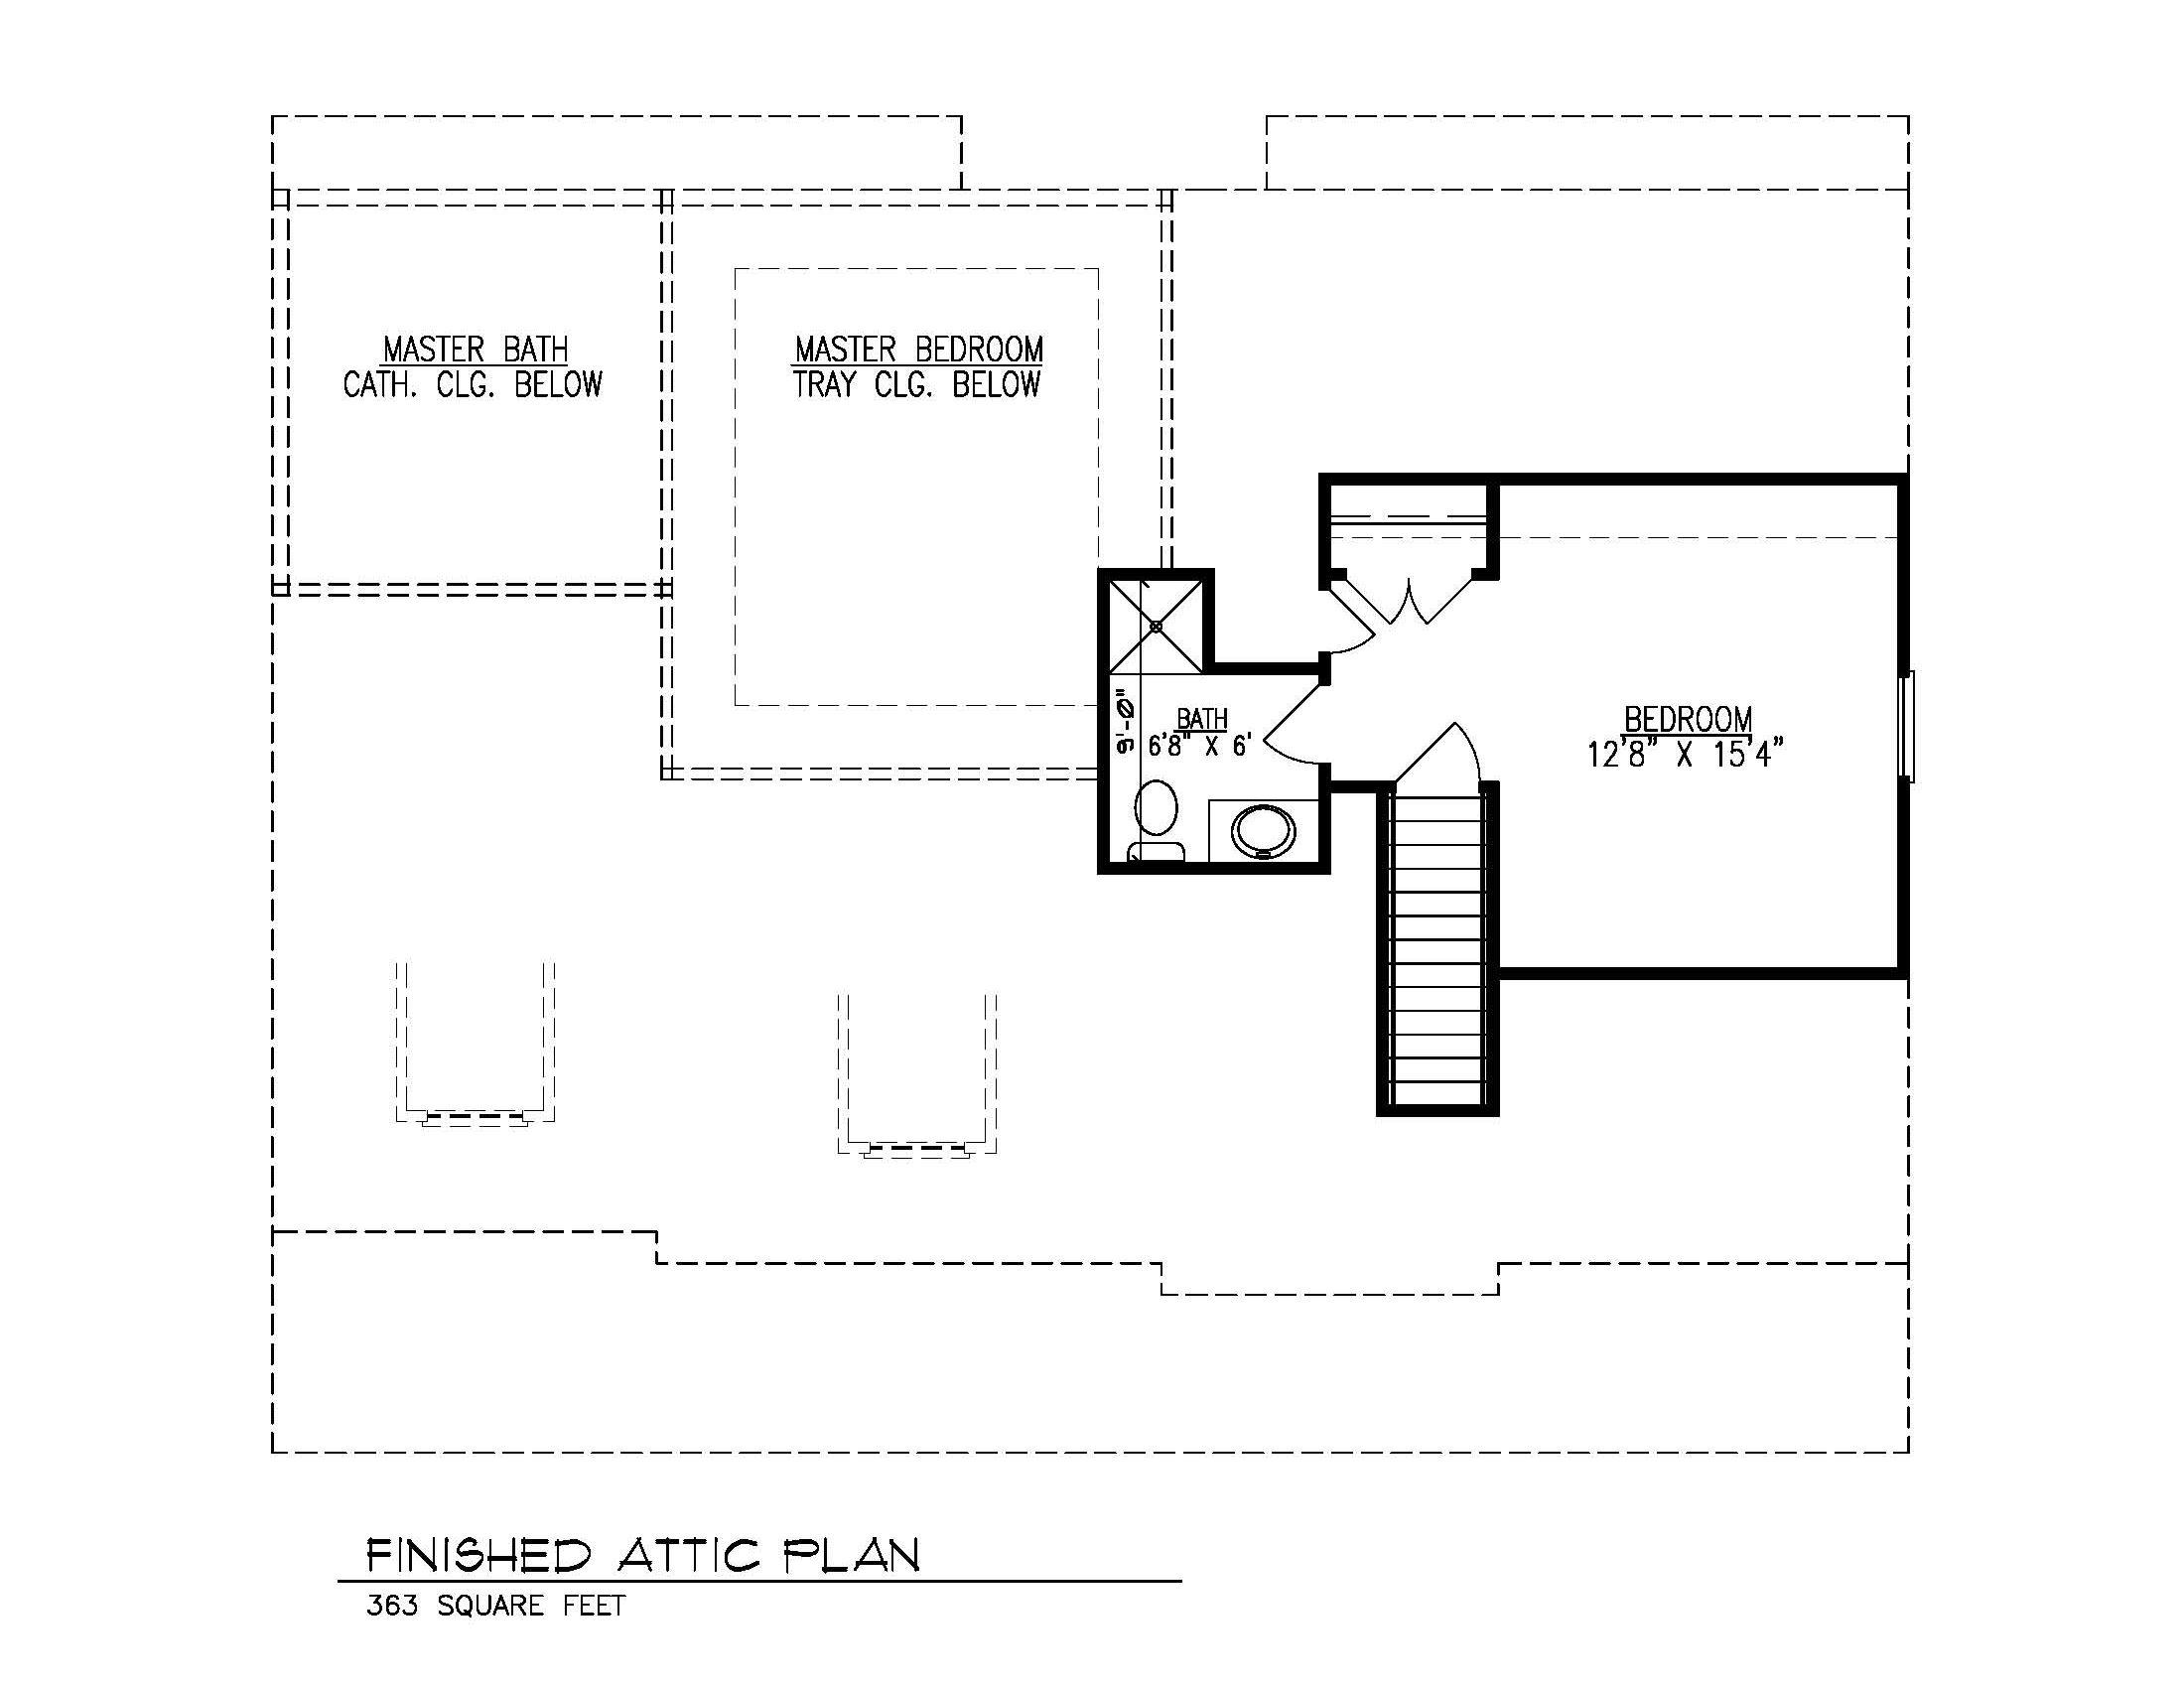 Finished Attic Floor Plan